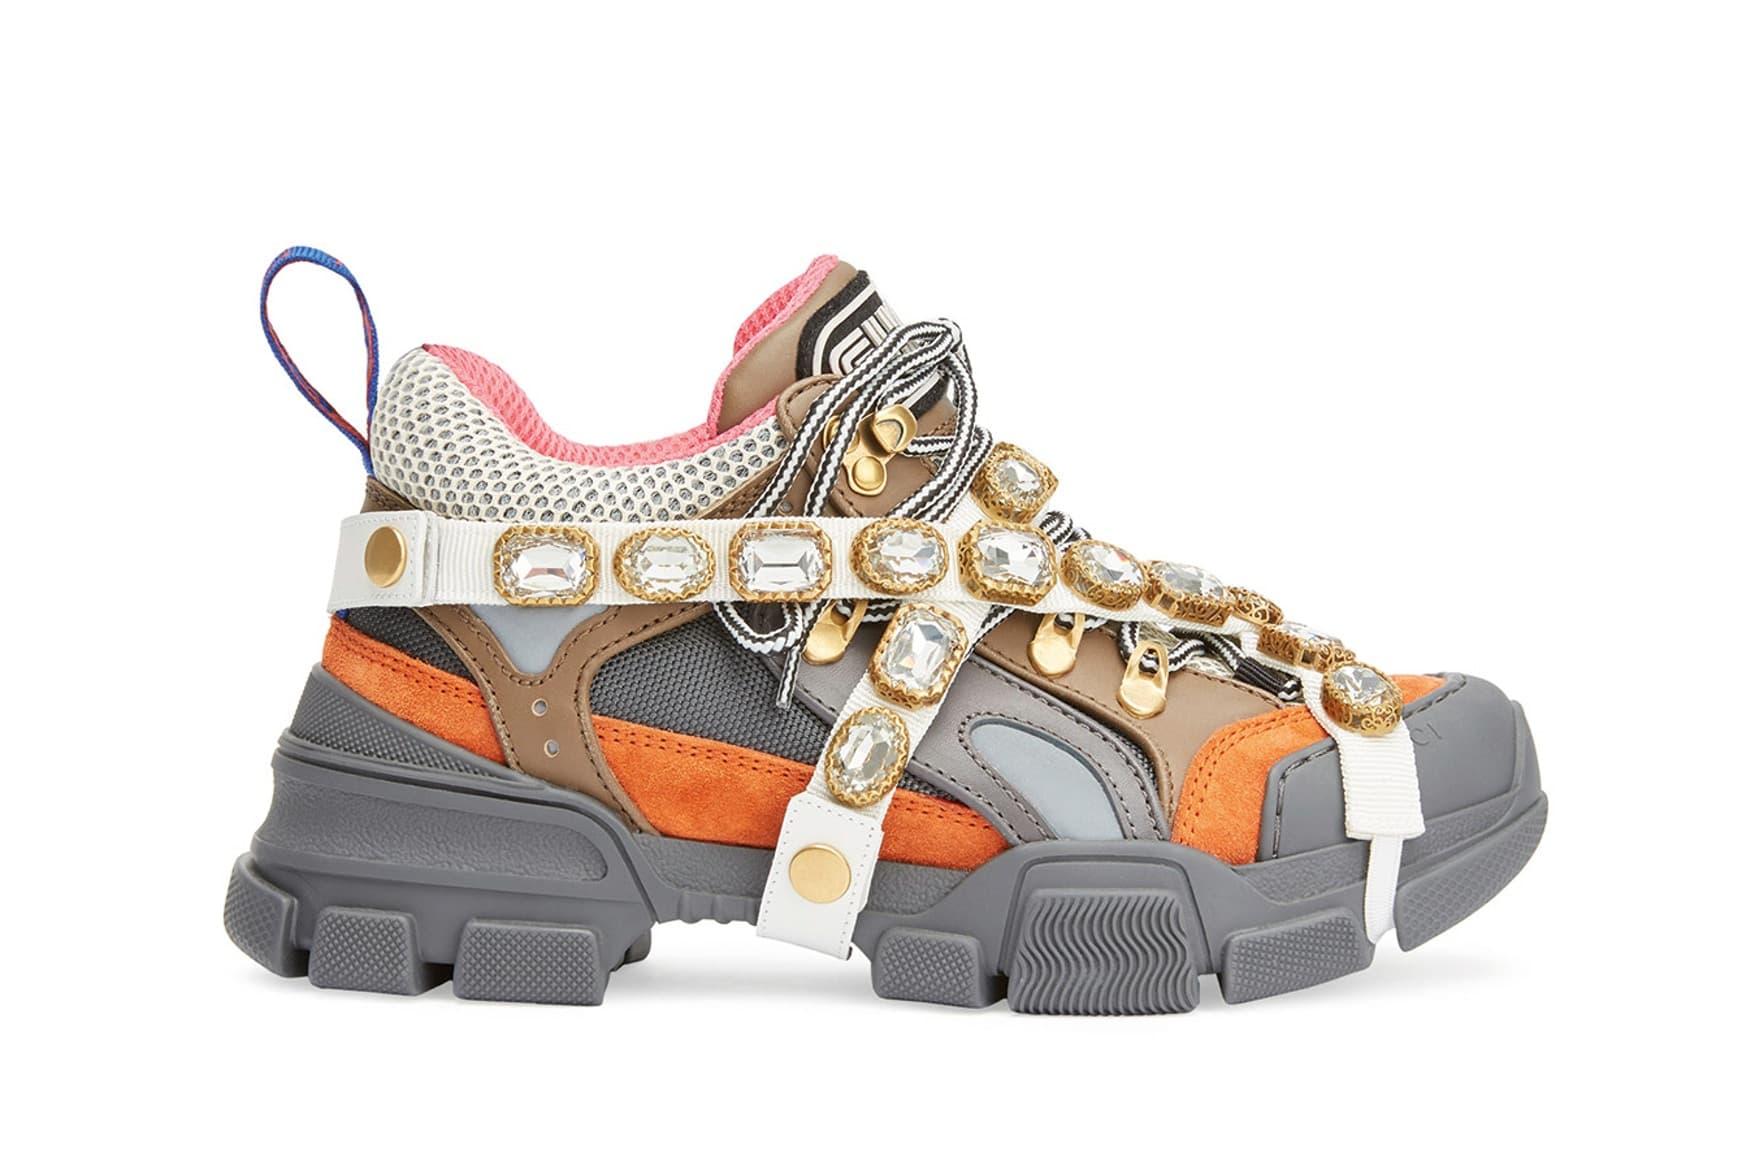 Gucci Chunky SEGA Jewel-Covered Sneakers